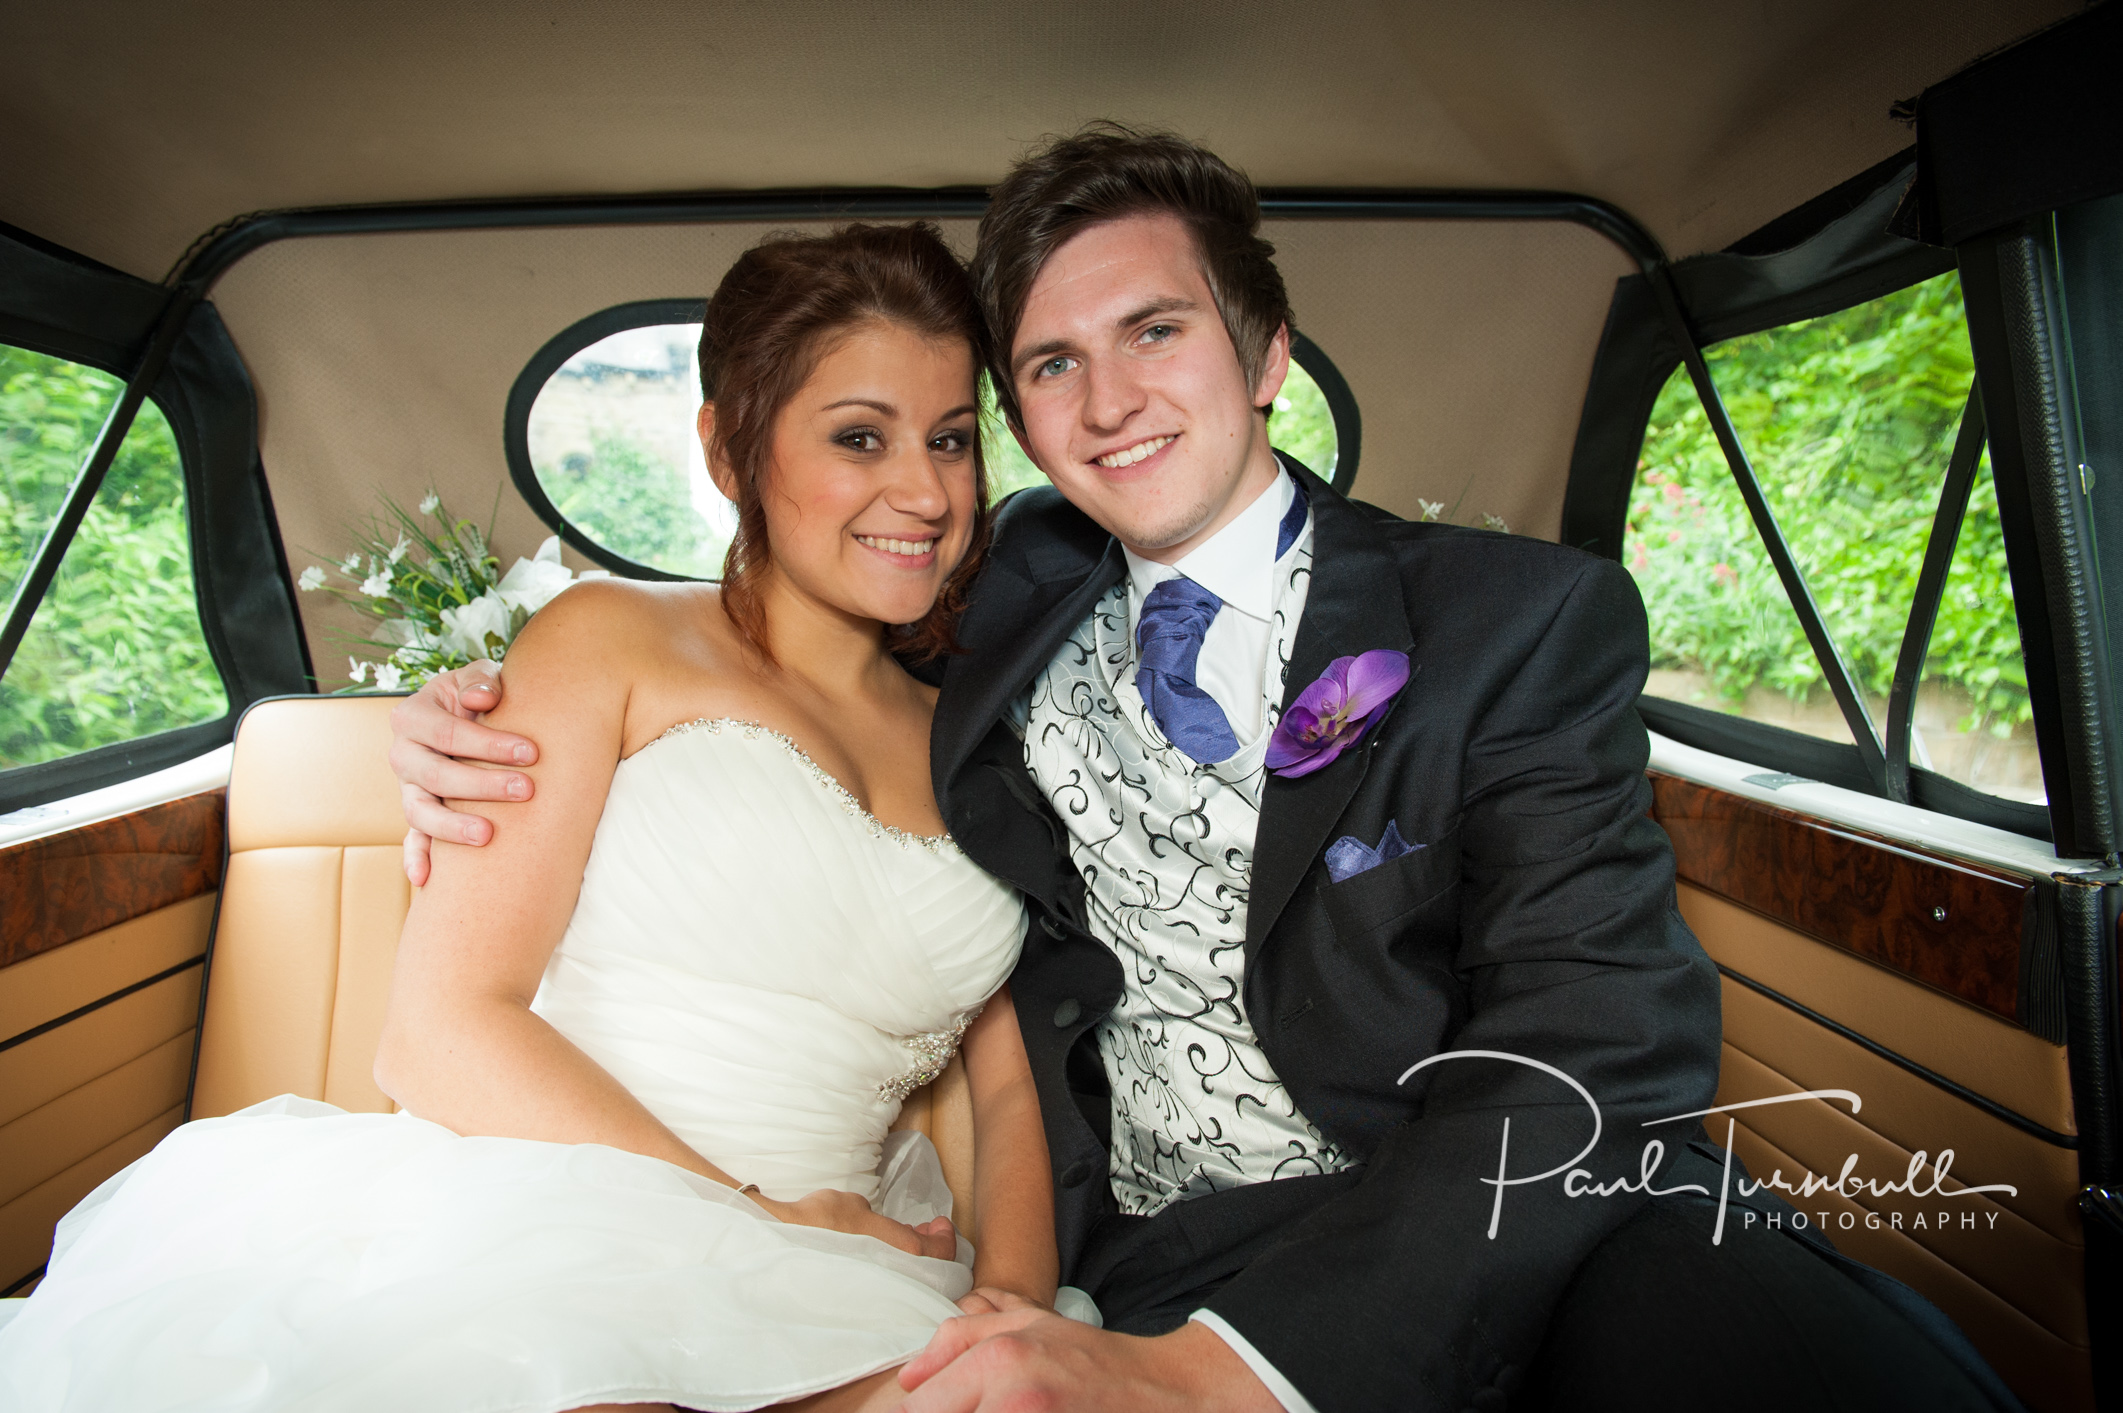 wedding-photography-healds-hall-liversedge-yorkshire-067.jpg